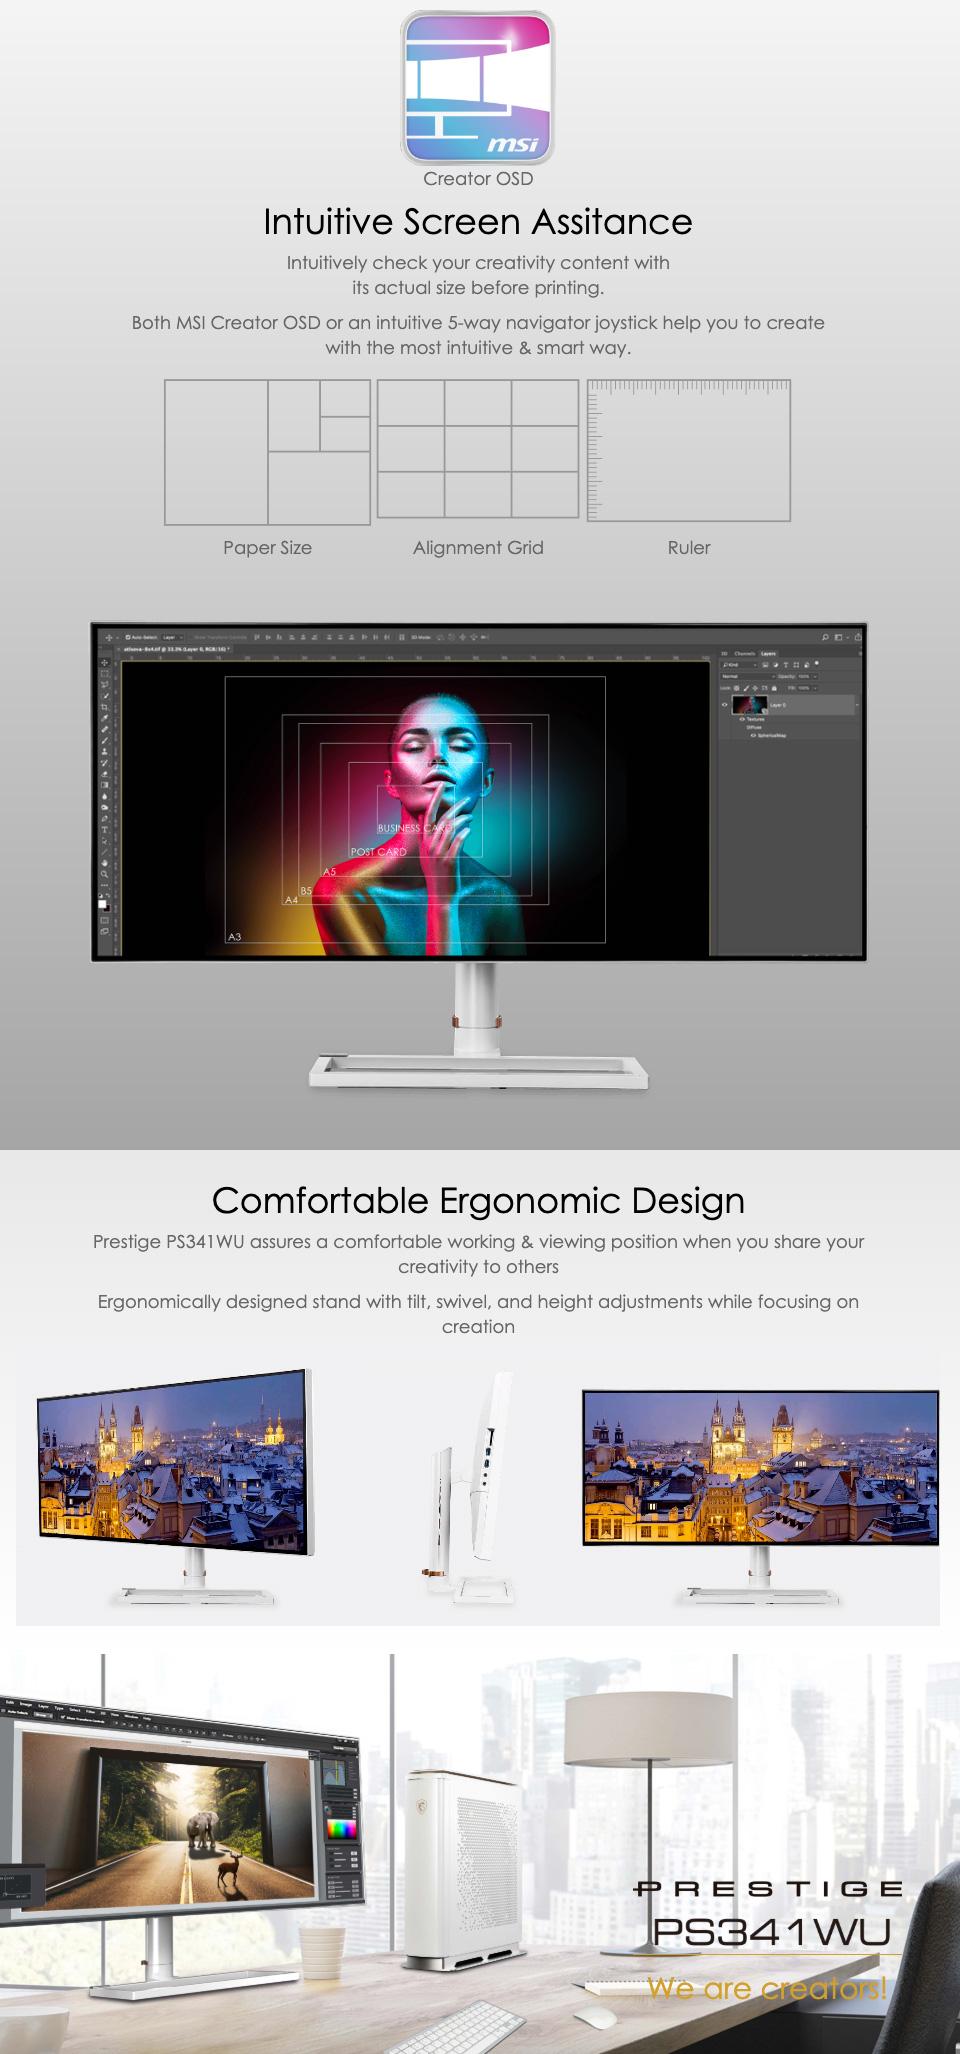 MSI Prestige PS341WU WUHD IPS 34in Monitor features 4